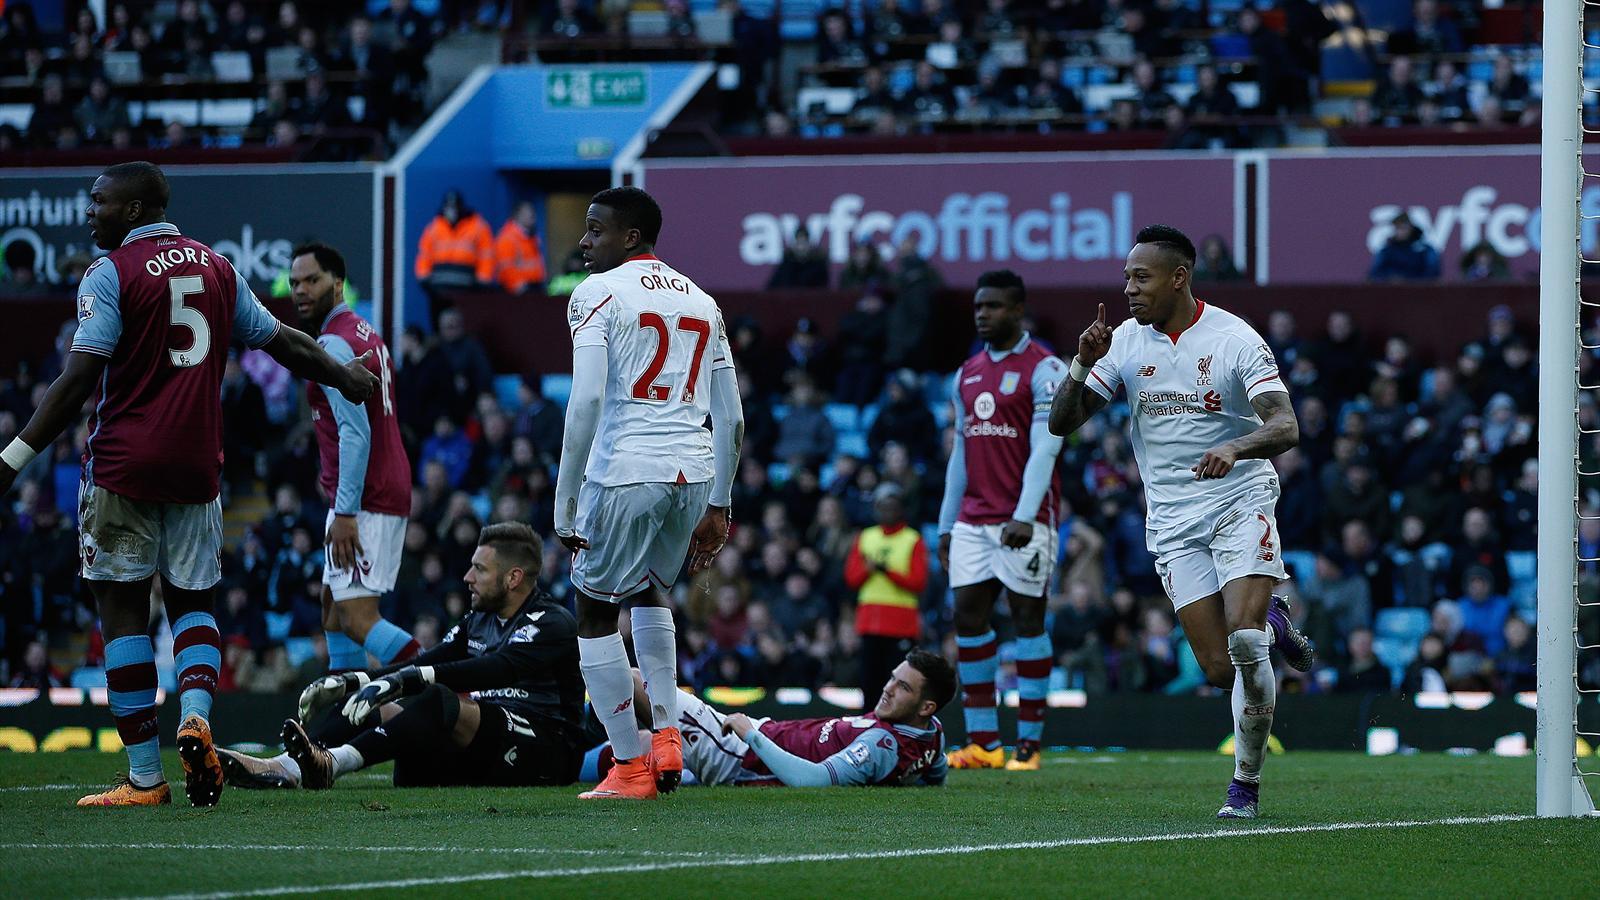 Jamie Carragher Makes Scathing Assessment Of Aston Villa After Liverpool Defeat Premier League